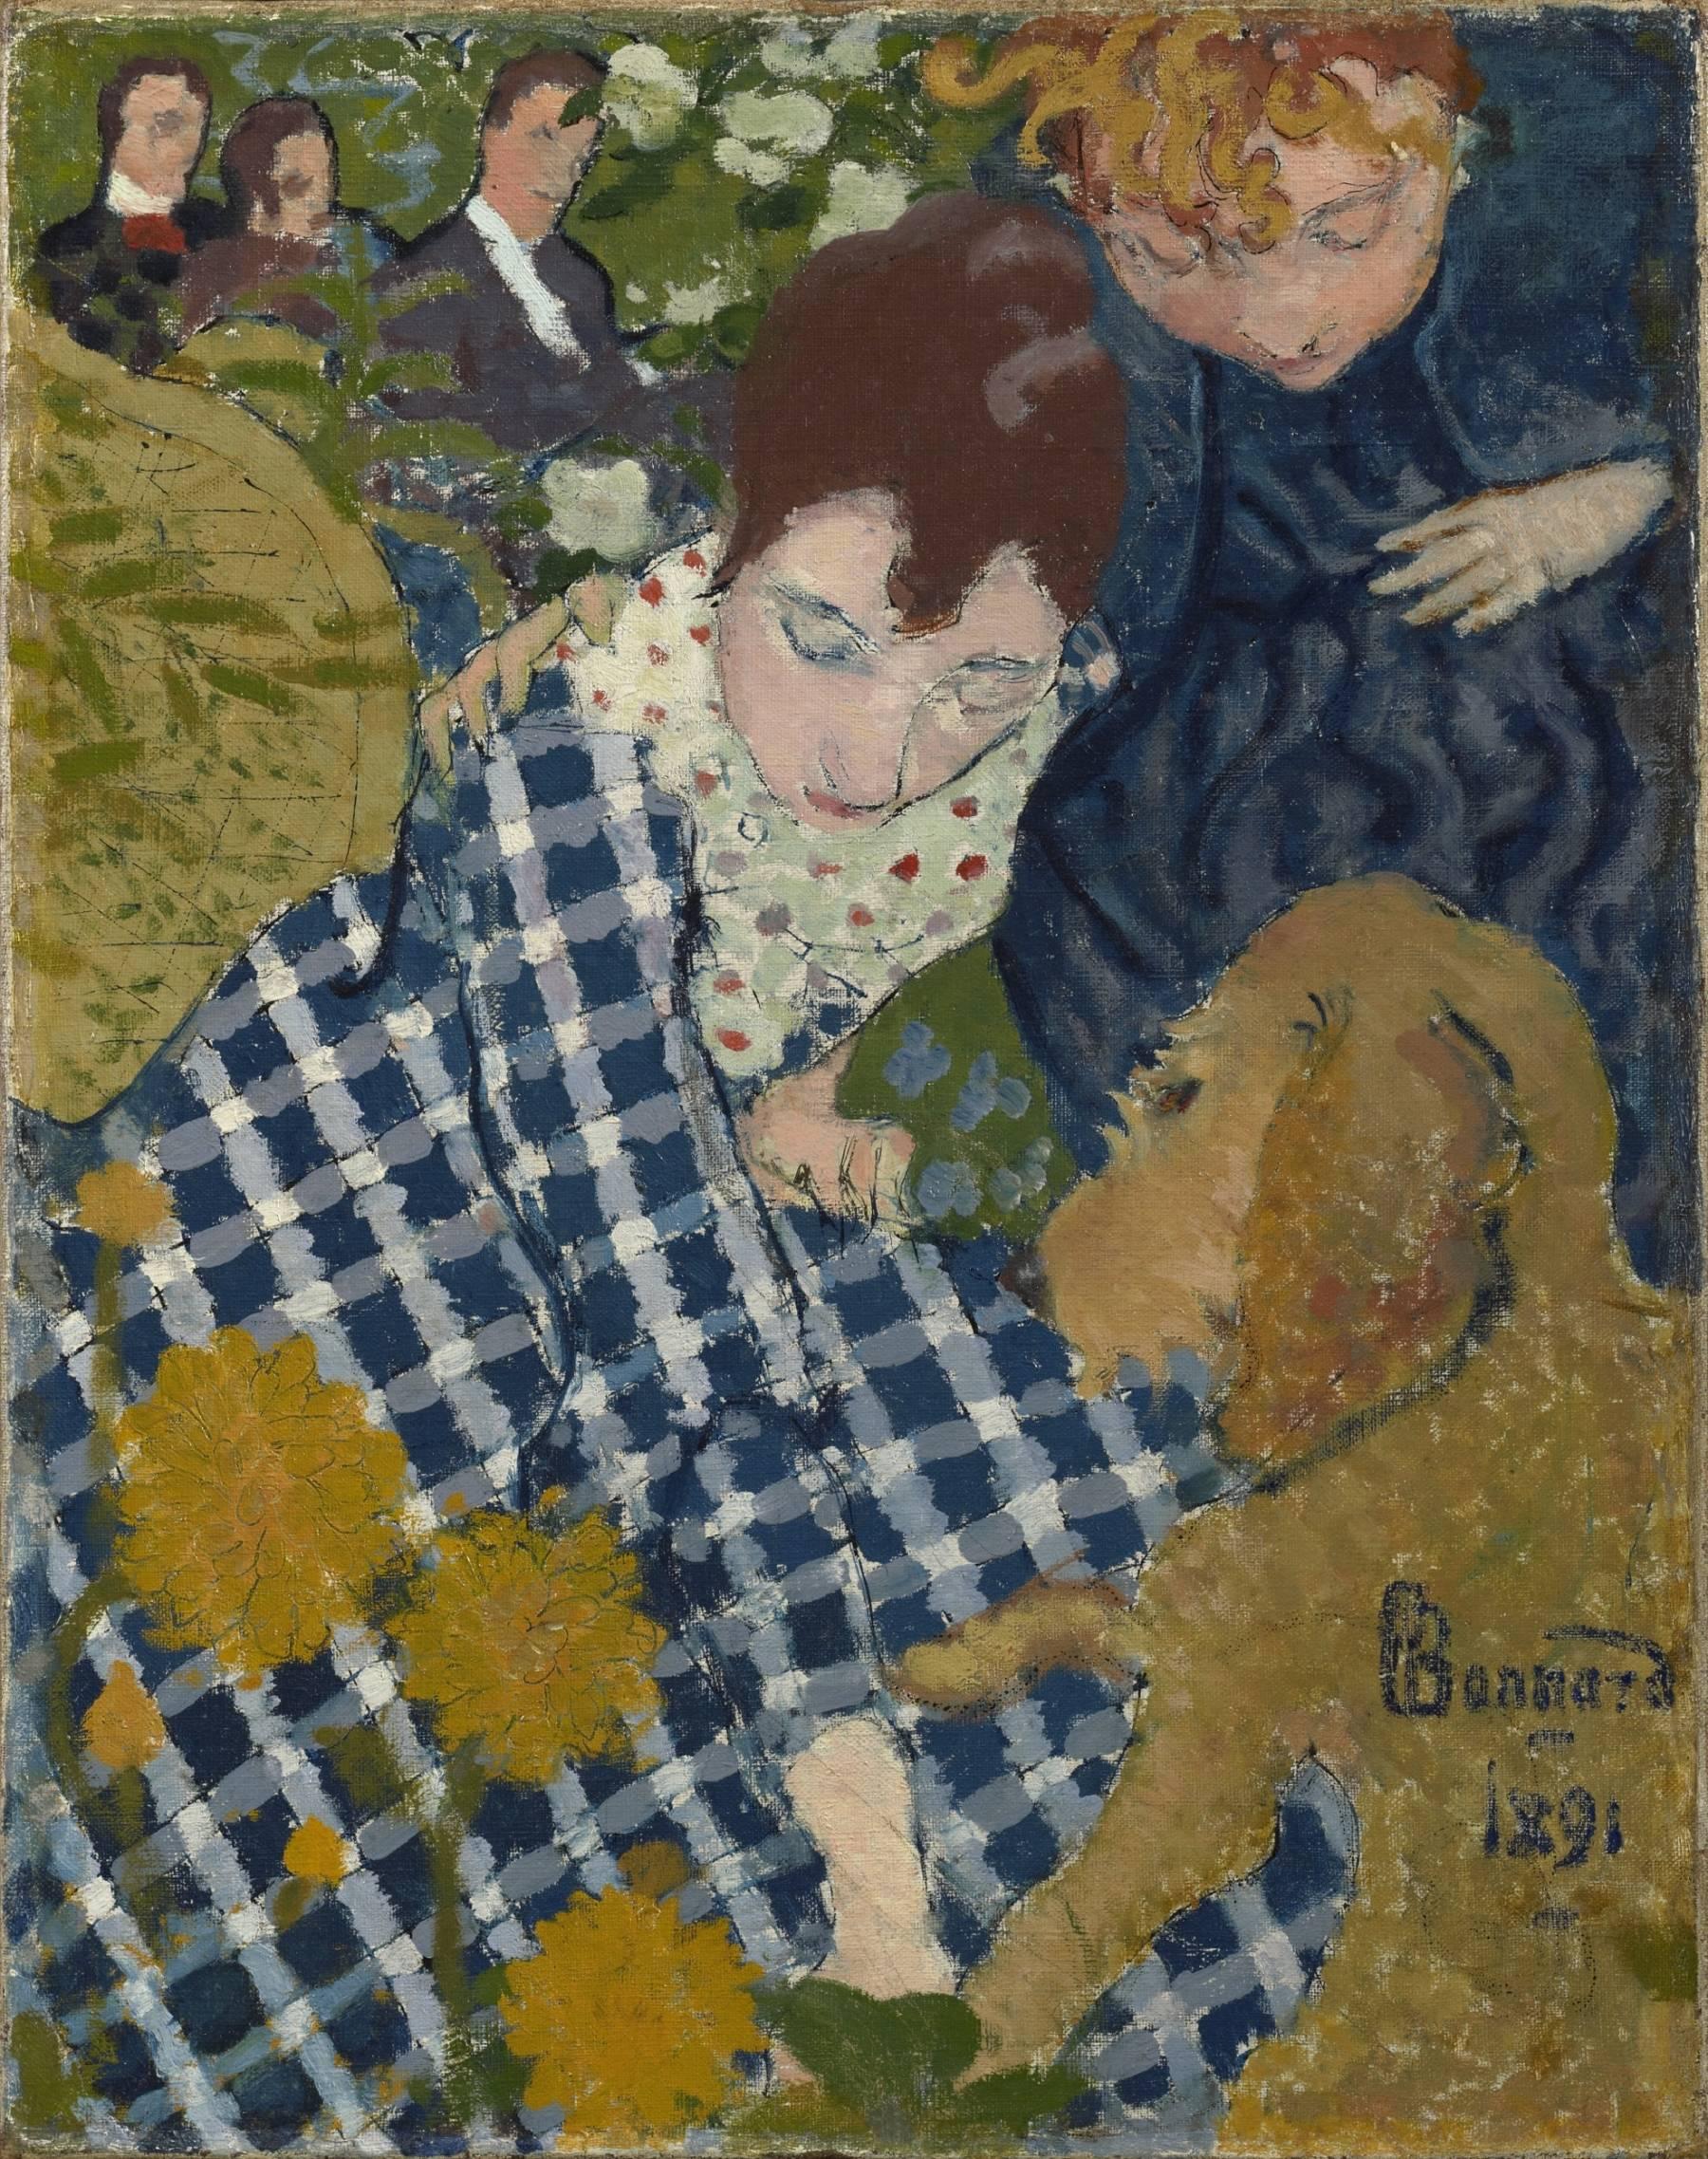 Pierre Bonnard, Femmes au chien